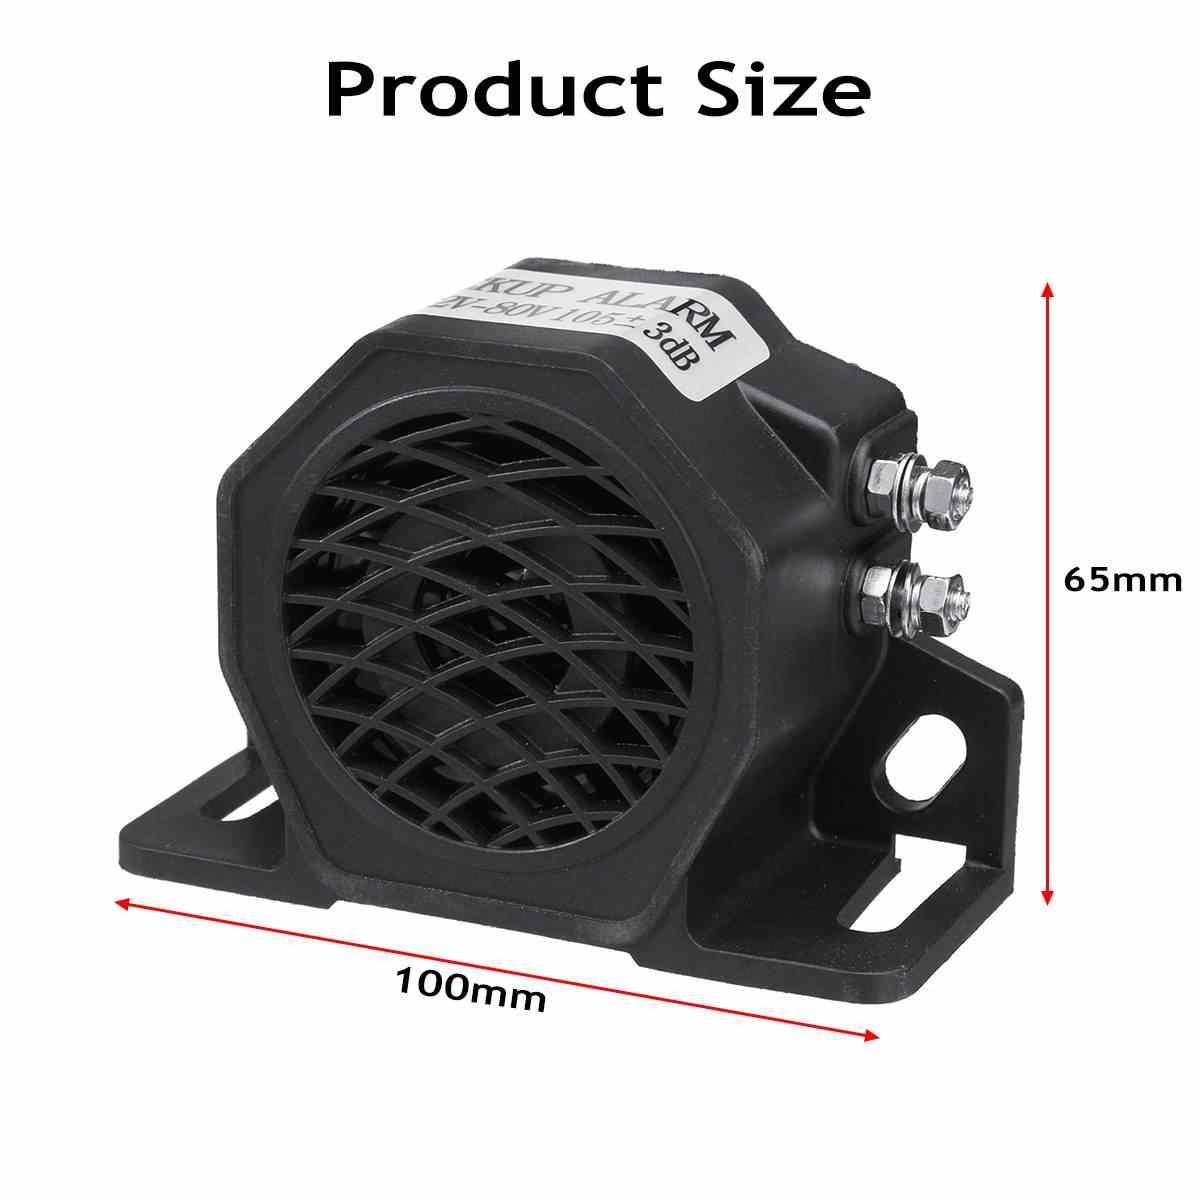 12 V-80 V Electric Buzzer Alarm Keras Speaker Peringatan Keamanan Mobil Tanduk Mobil Sirene Polisi Sirene Tanduk Udara kendaraan Listrik